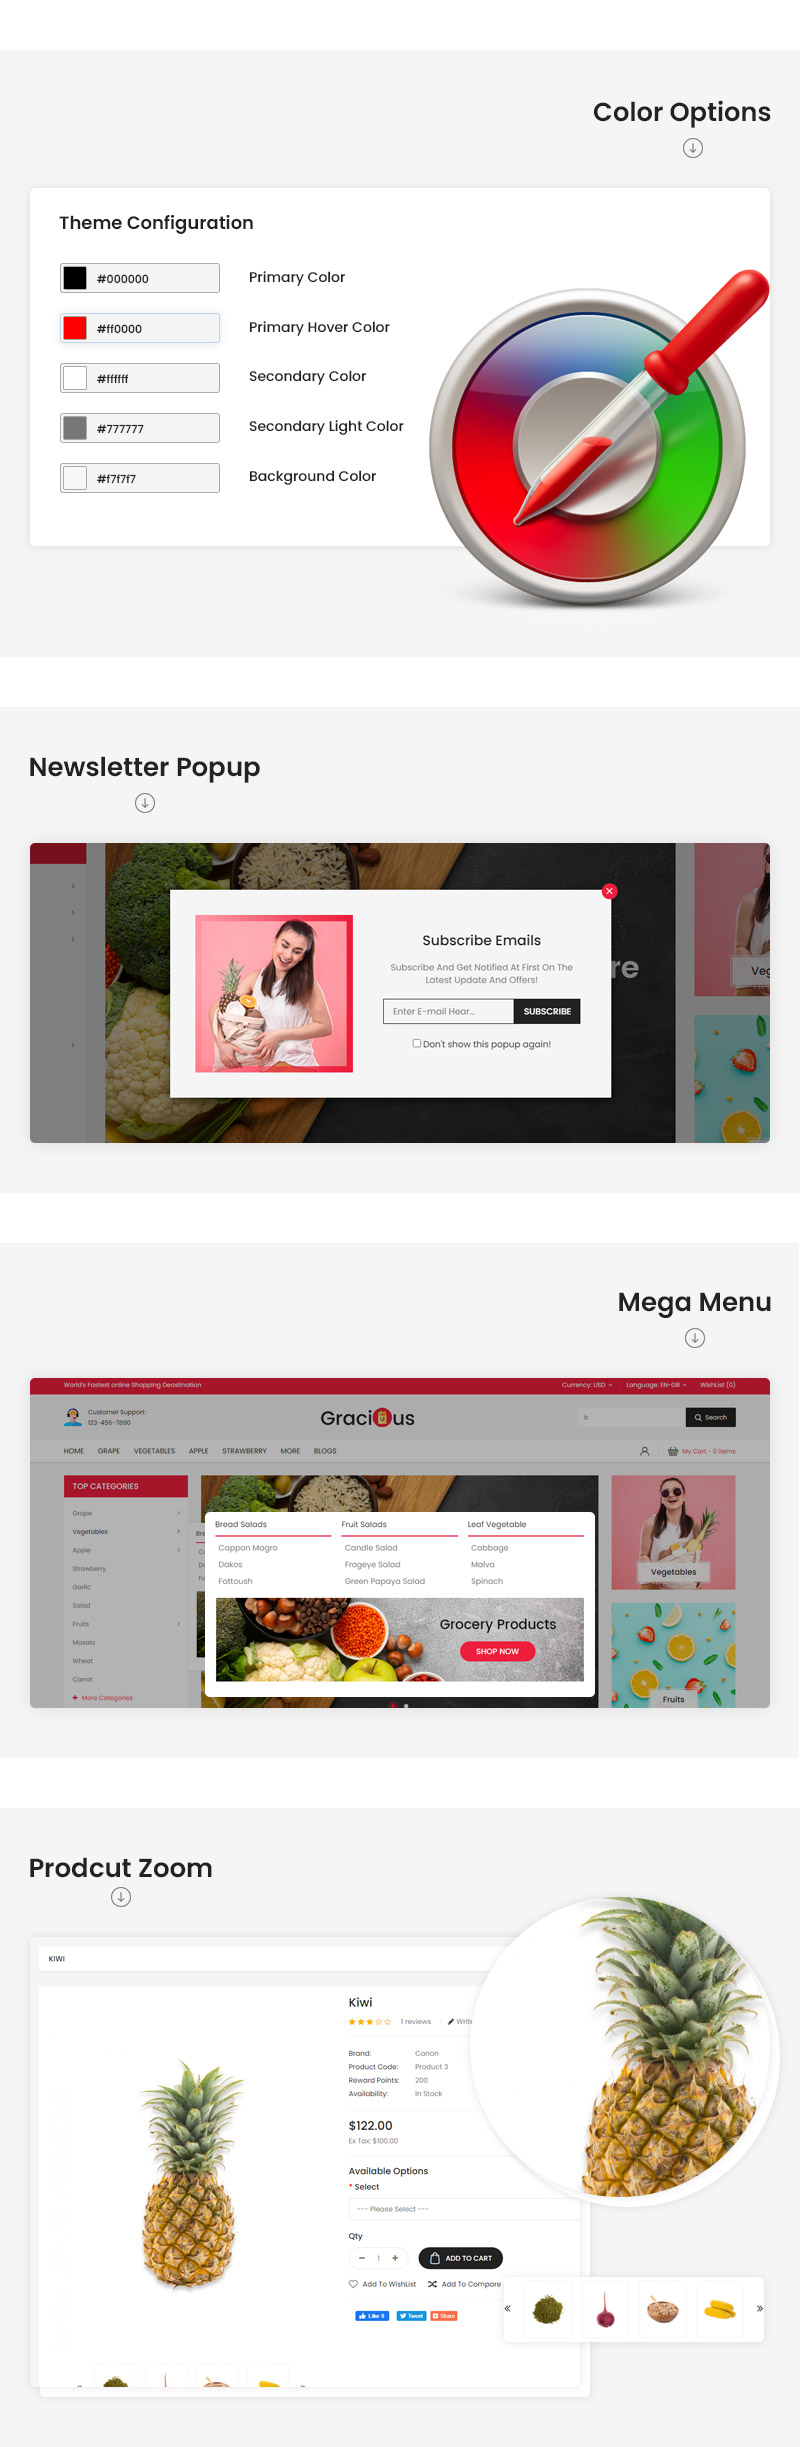 gracious-features-3.jpg